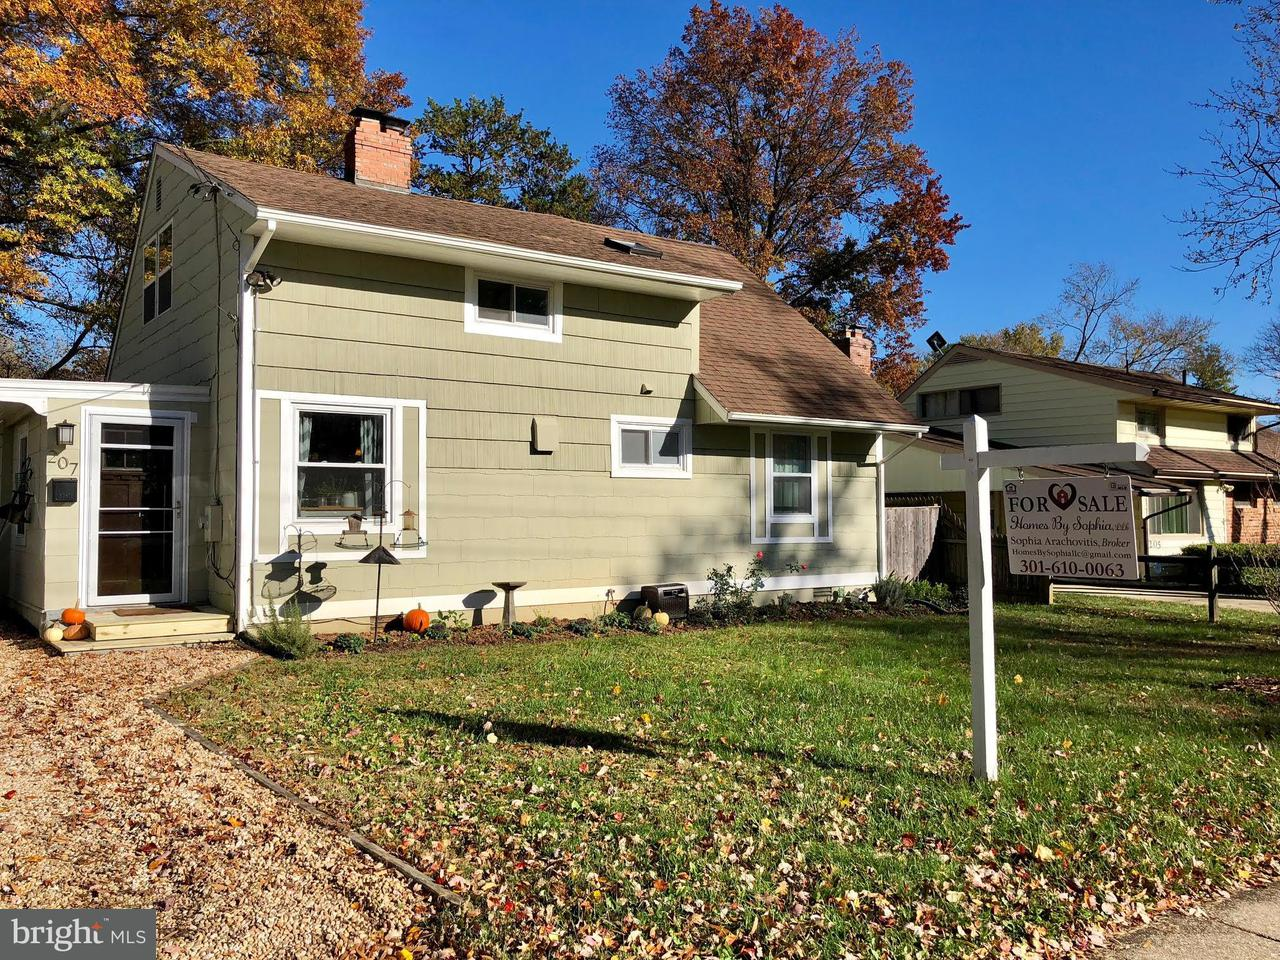 Single Family Home for Sale at 207 NIMITZ Avenue 207 NIMITZ Avenue Rockville, Maryland 20851 United States